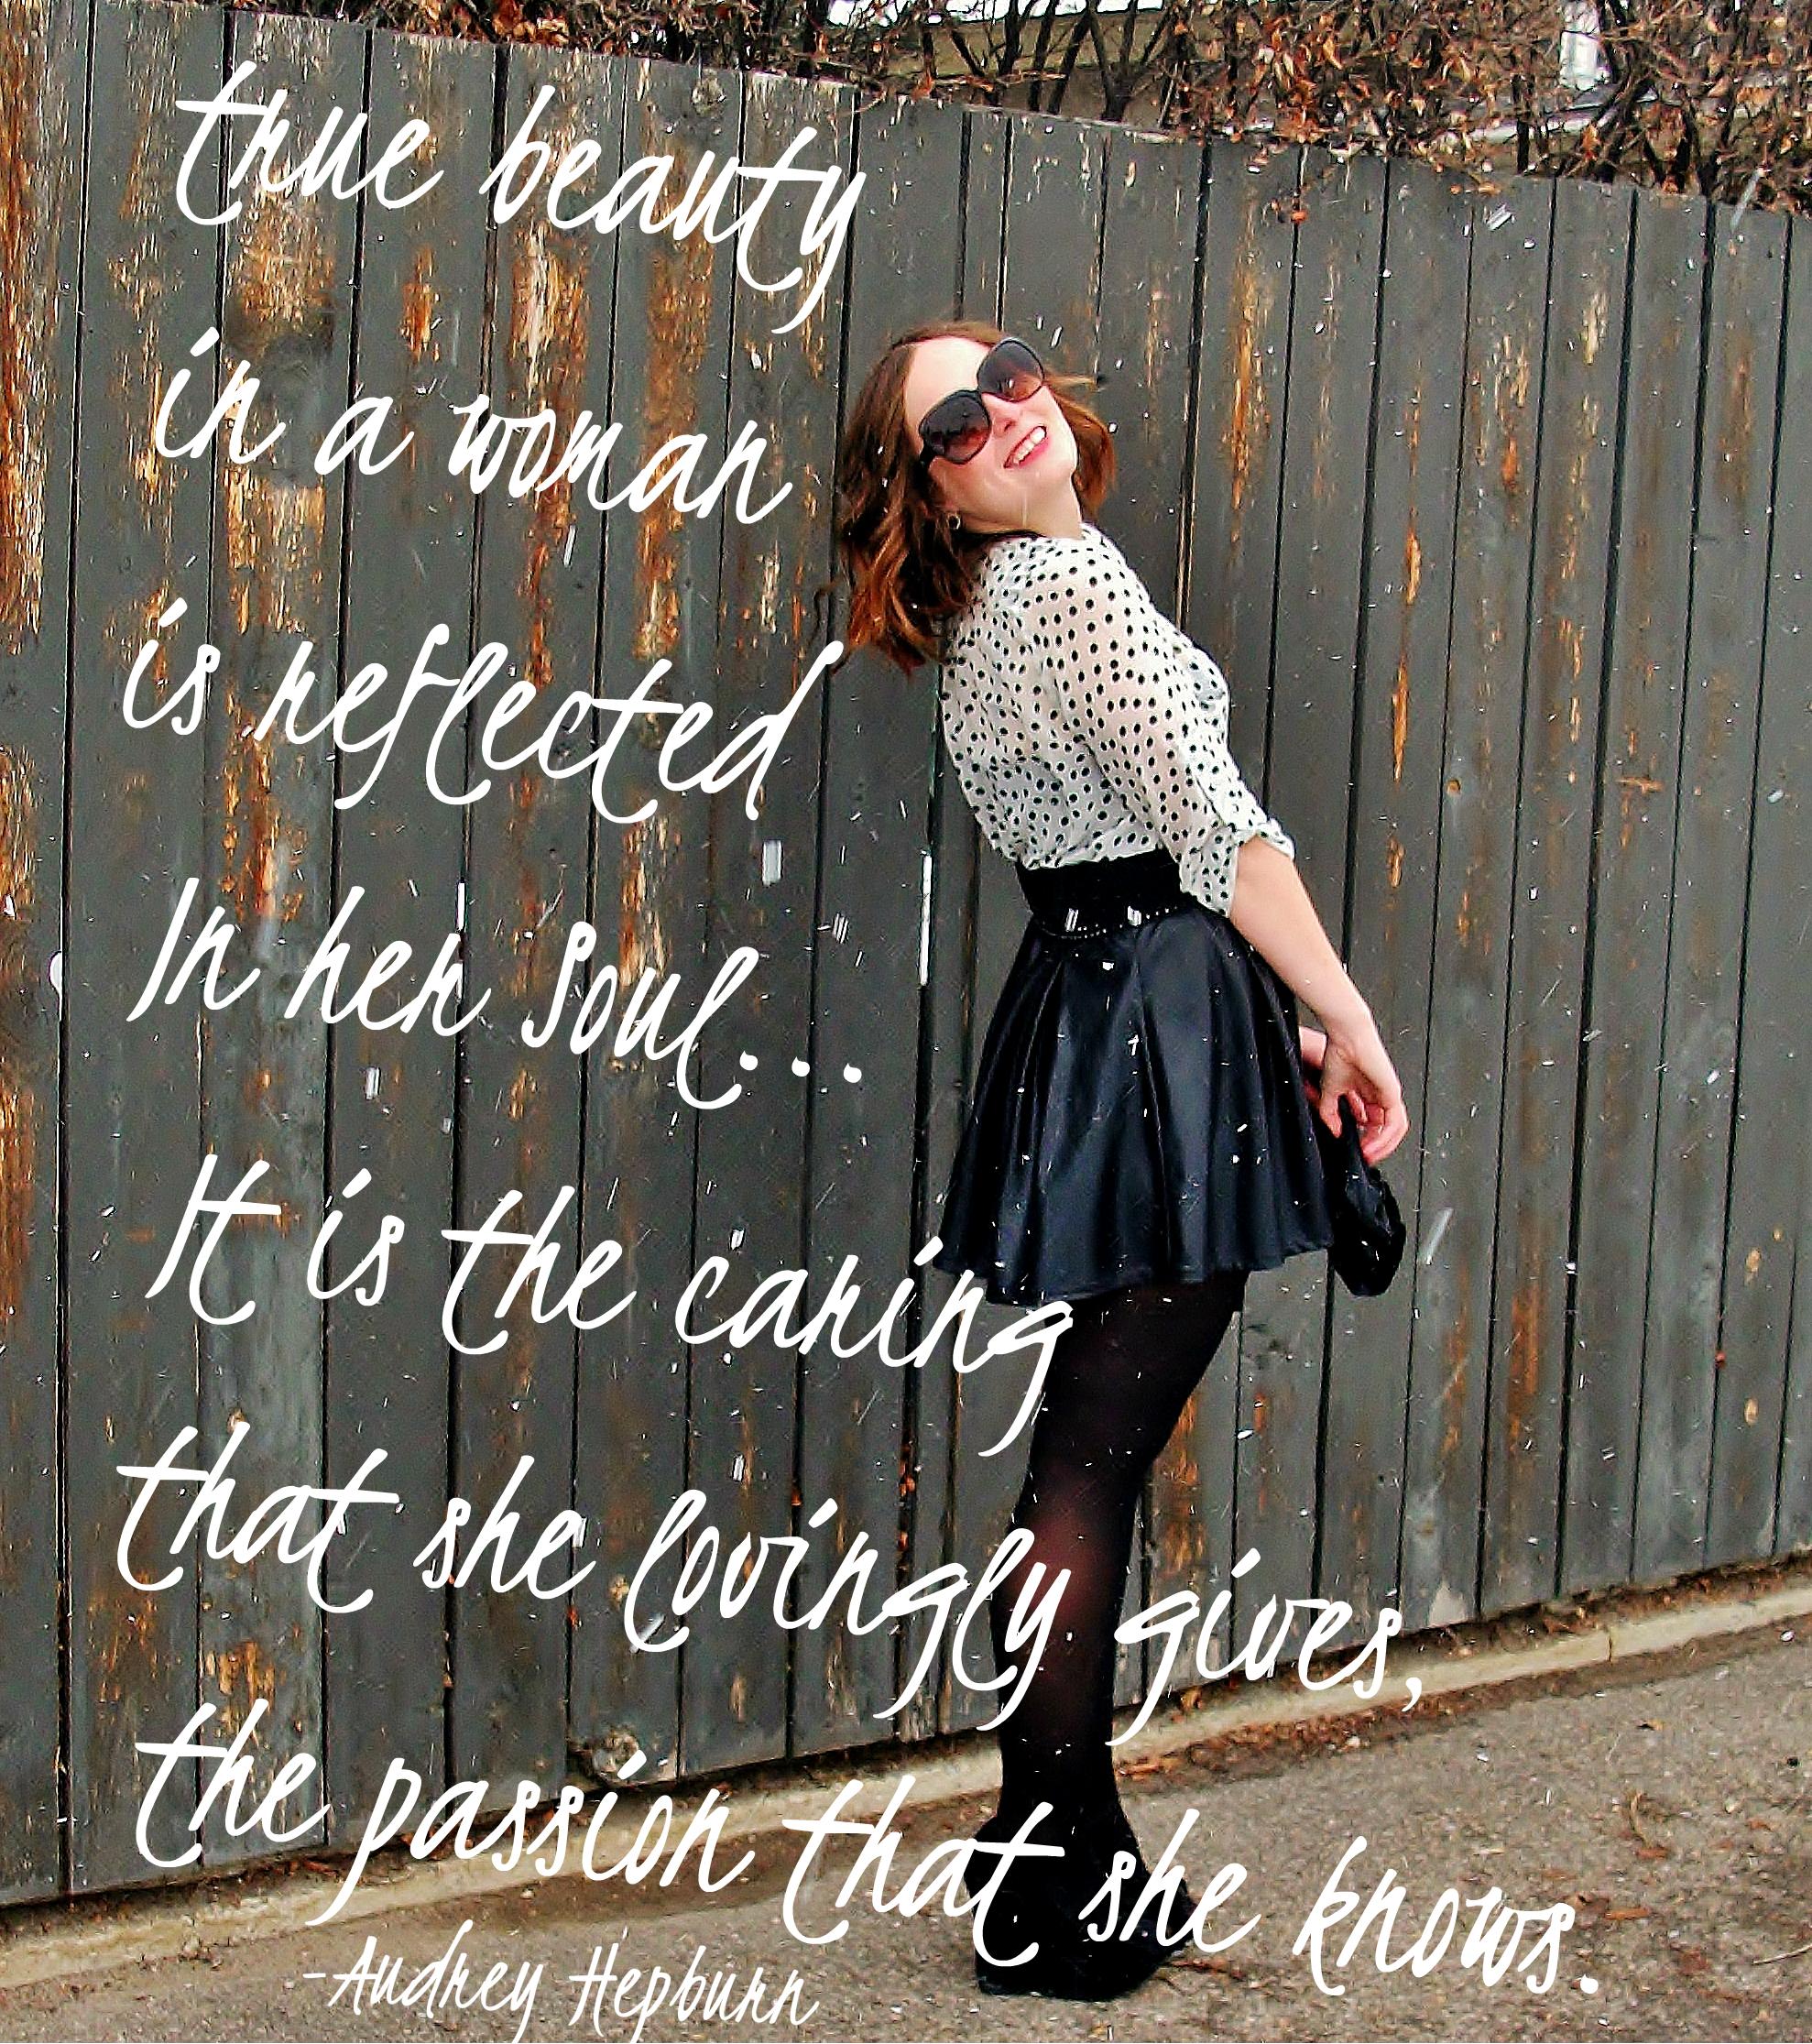 Audrey hepburn quotes aiyana jane